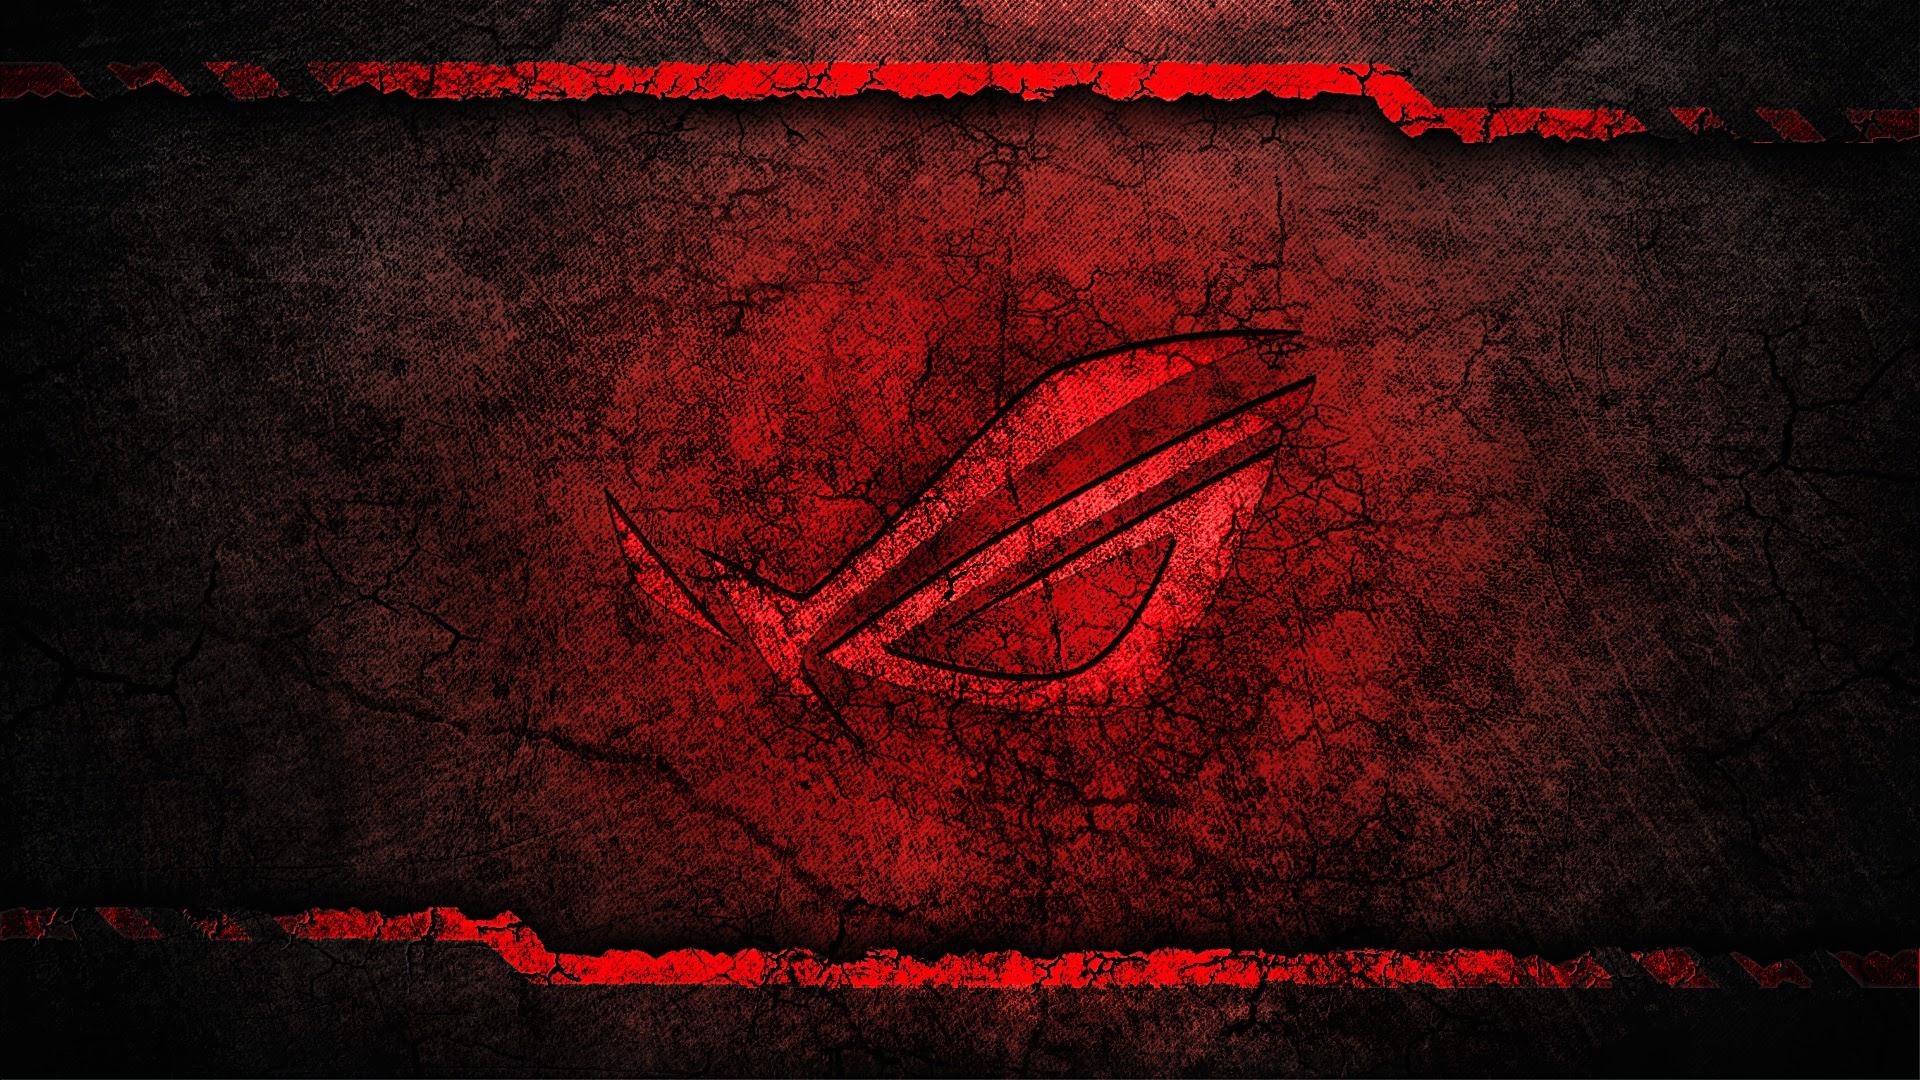 asus rog republic of gamers logo grunge background hd wallpaper 1920x1080